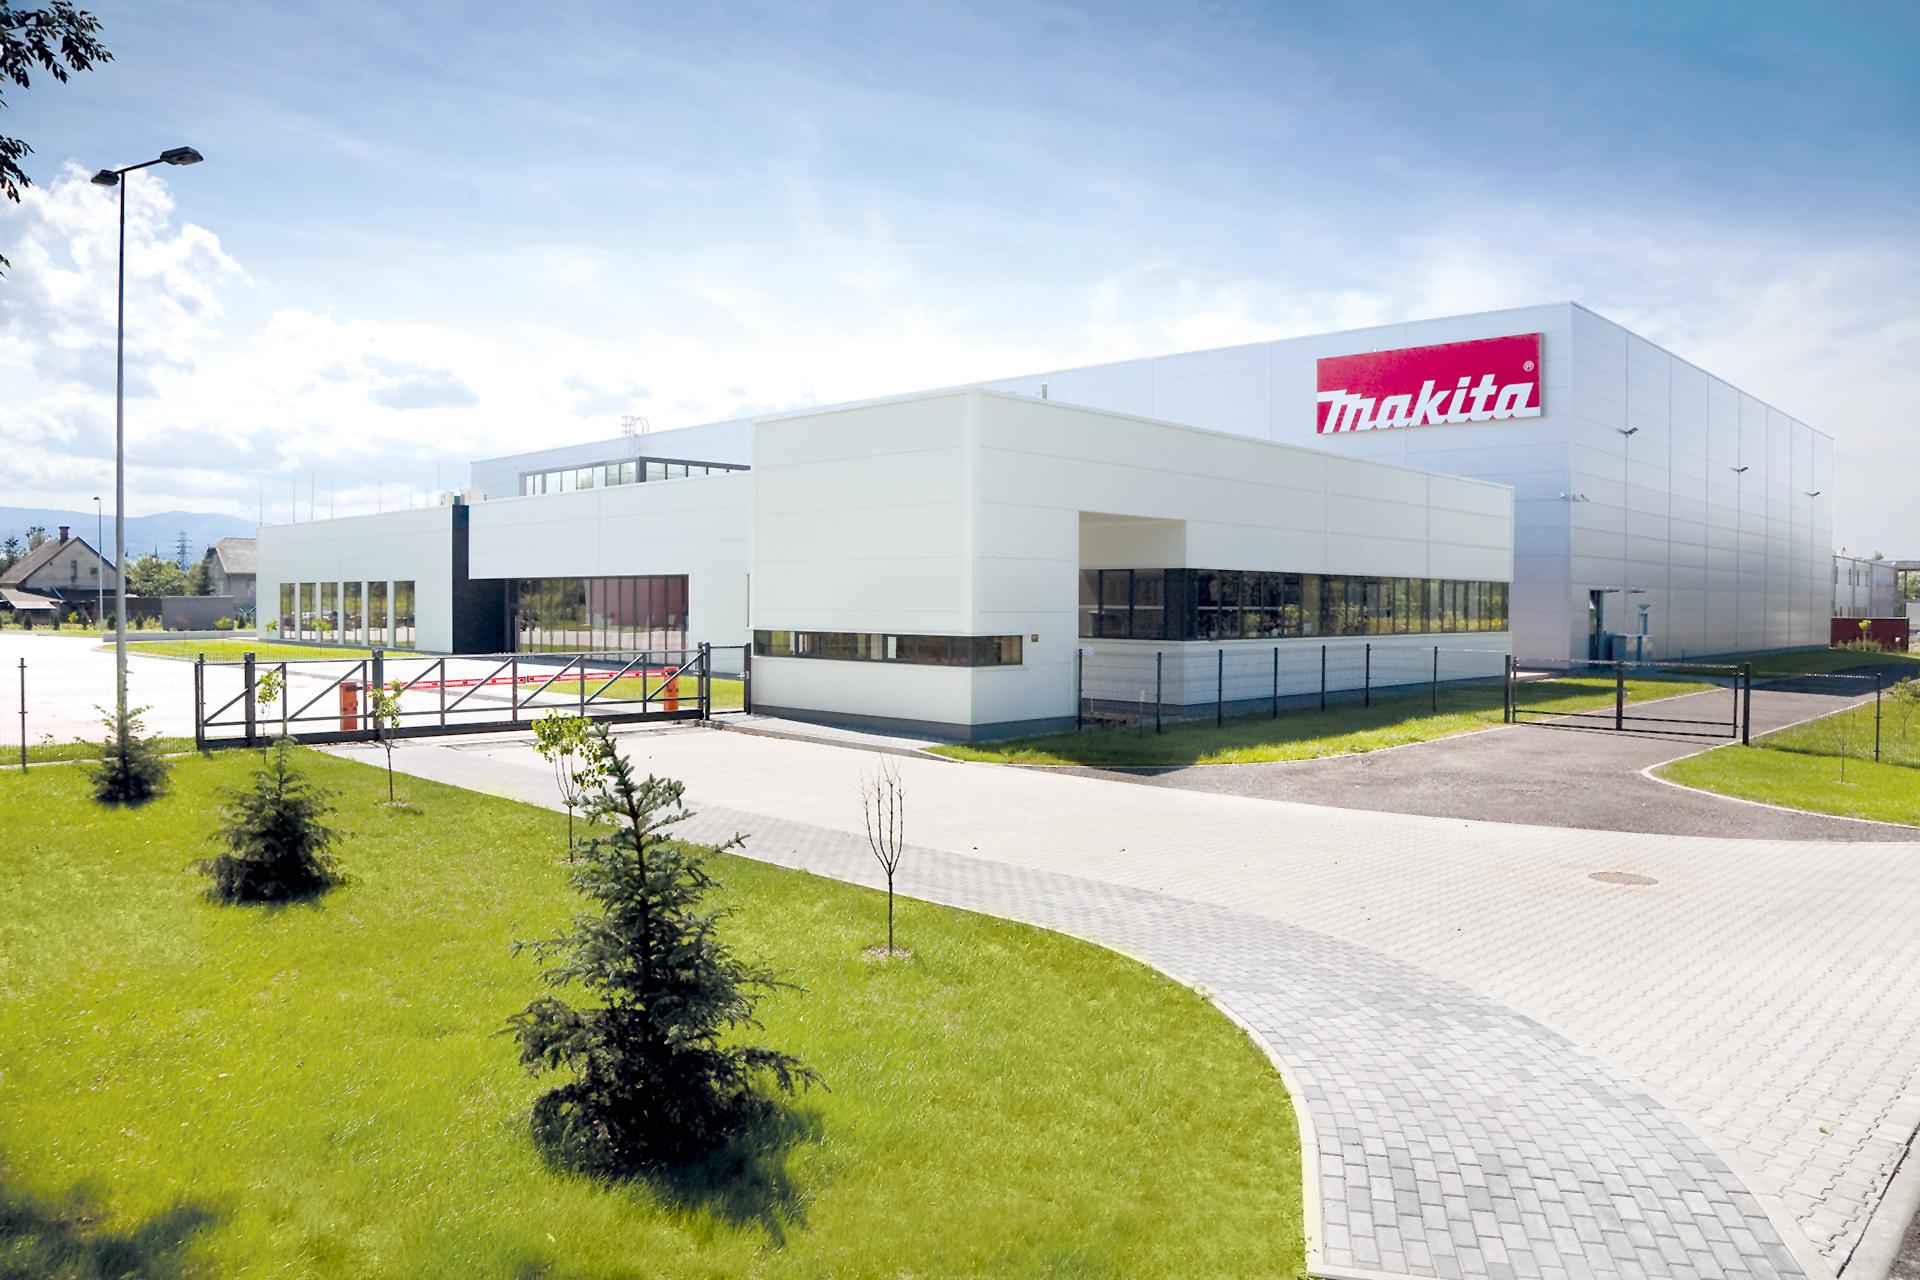 Makita Office and Warehouse in Bielsko-Biala Poland built by Takenaka Europe